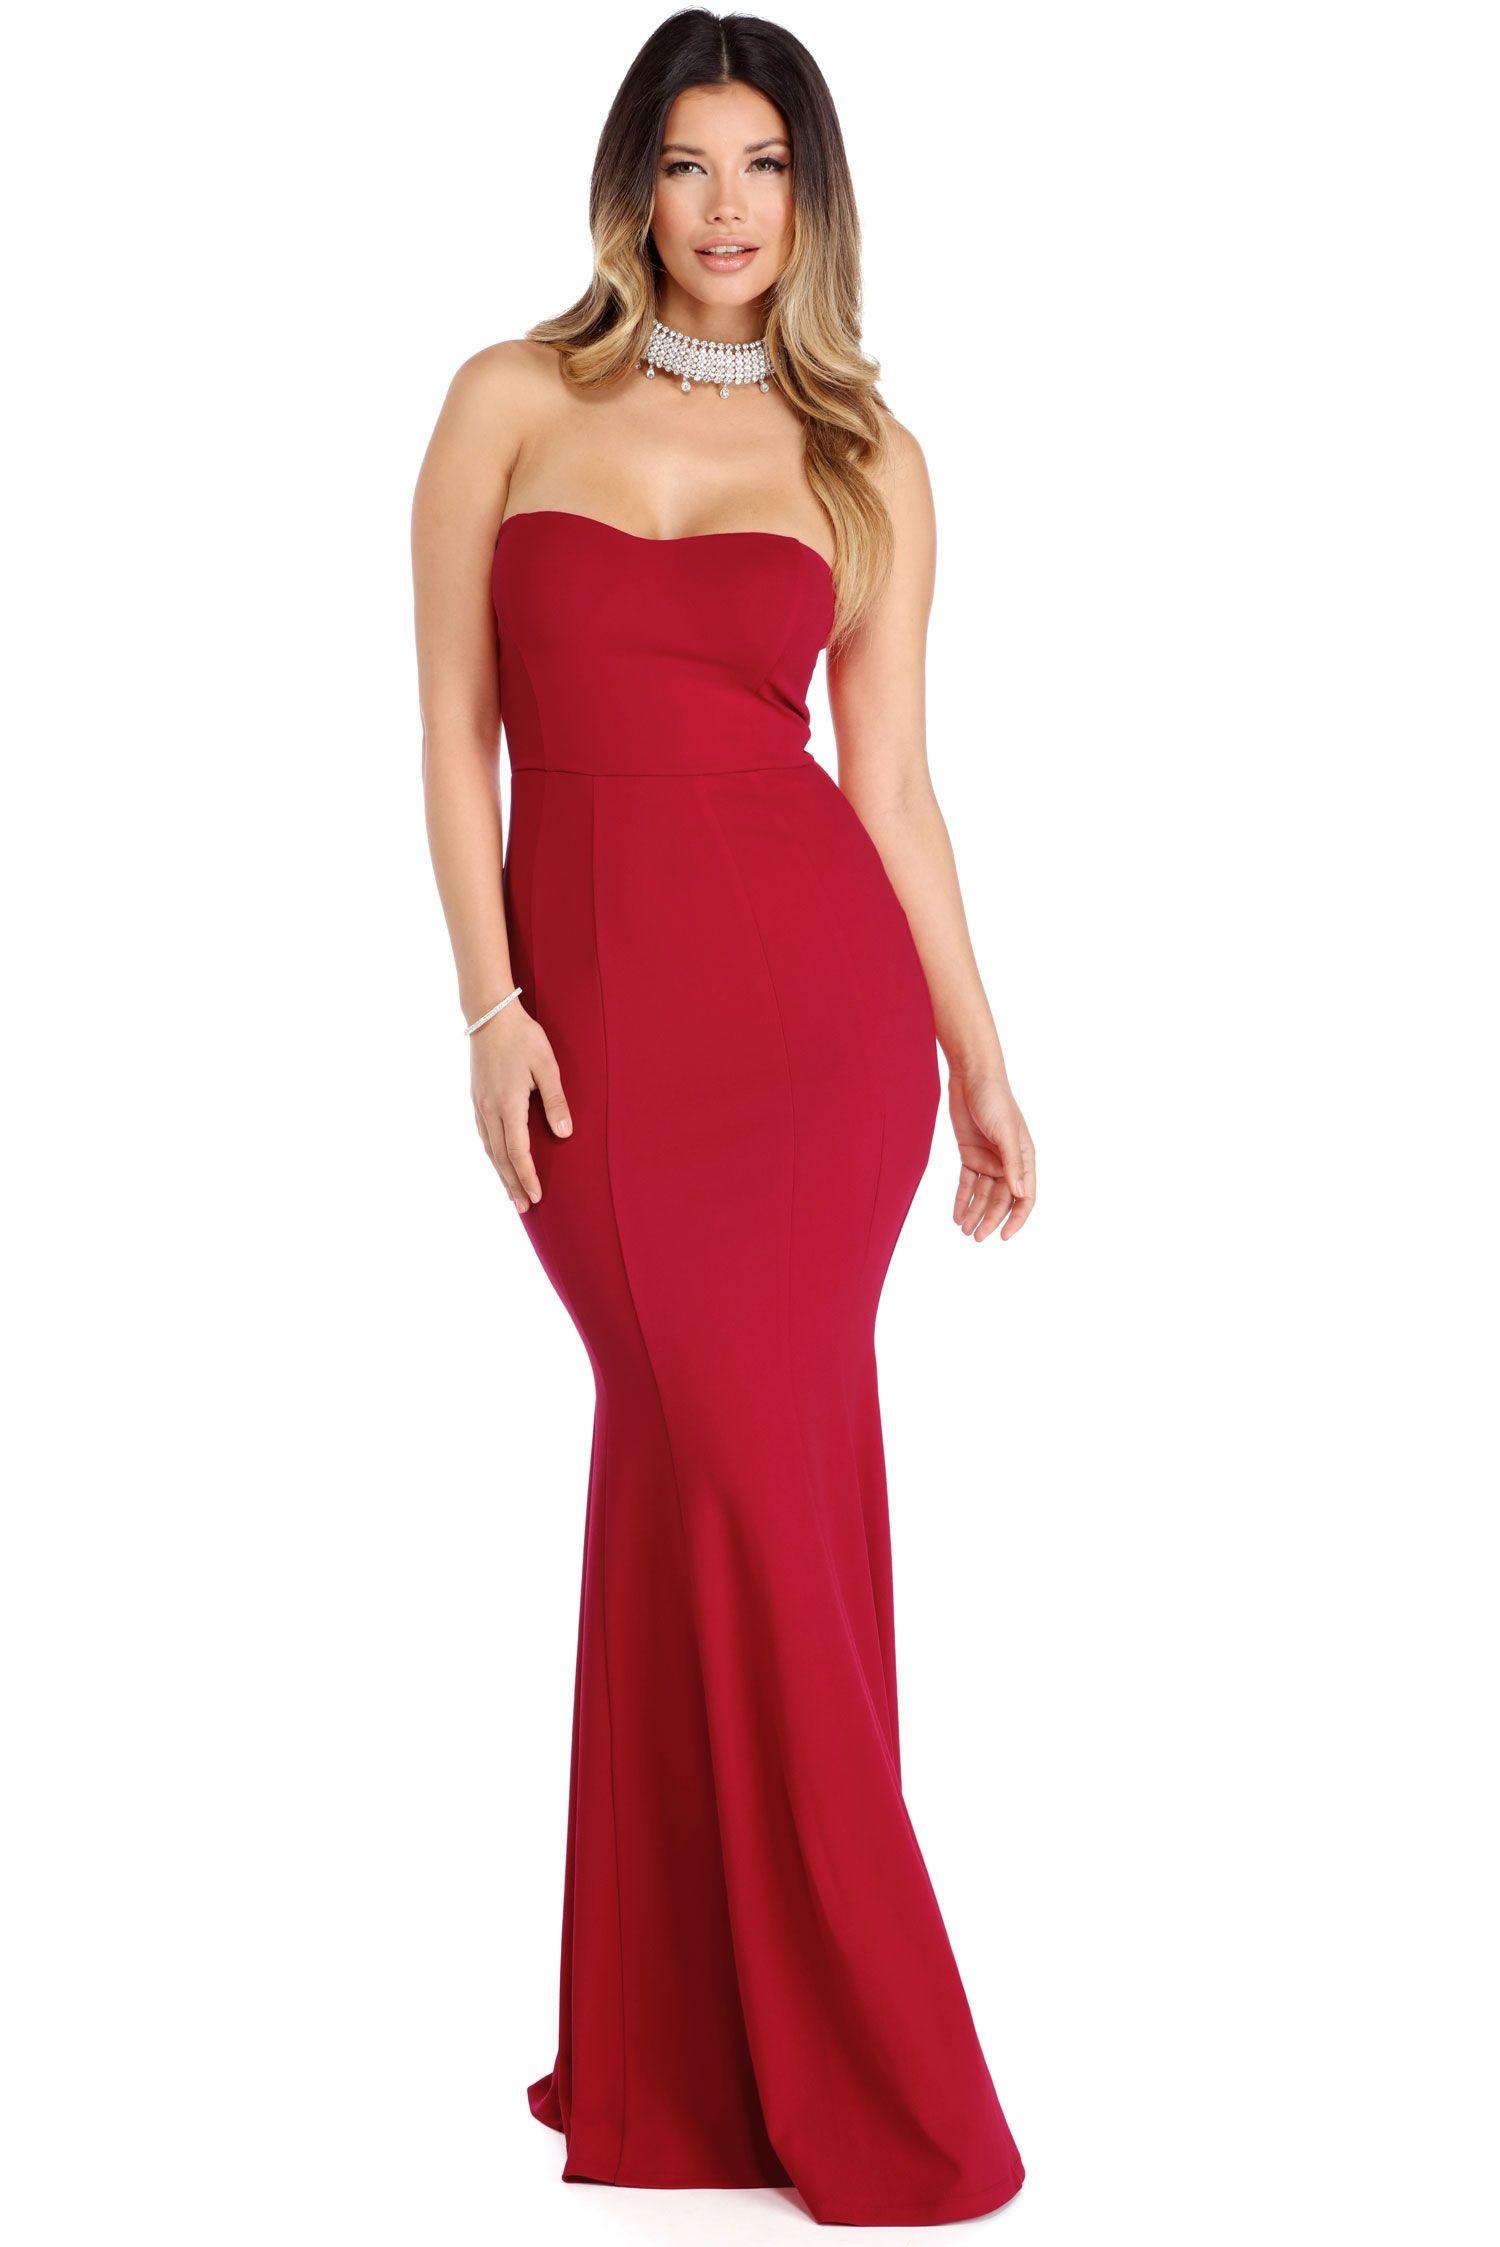 Samantha Red Strapless Mermaid Gown | Formal | Pinterest | Mermaid ...